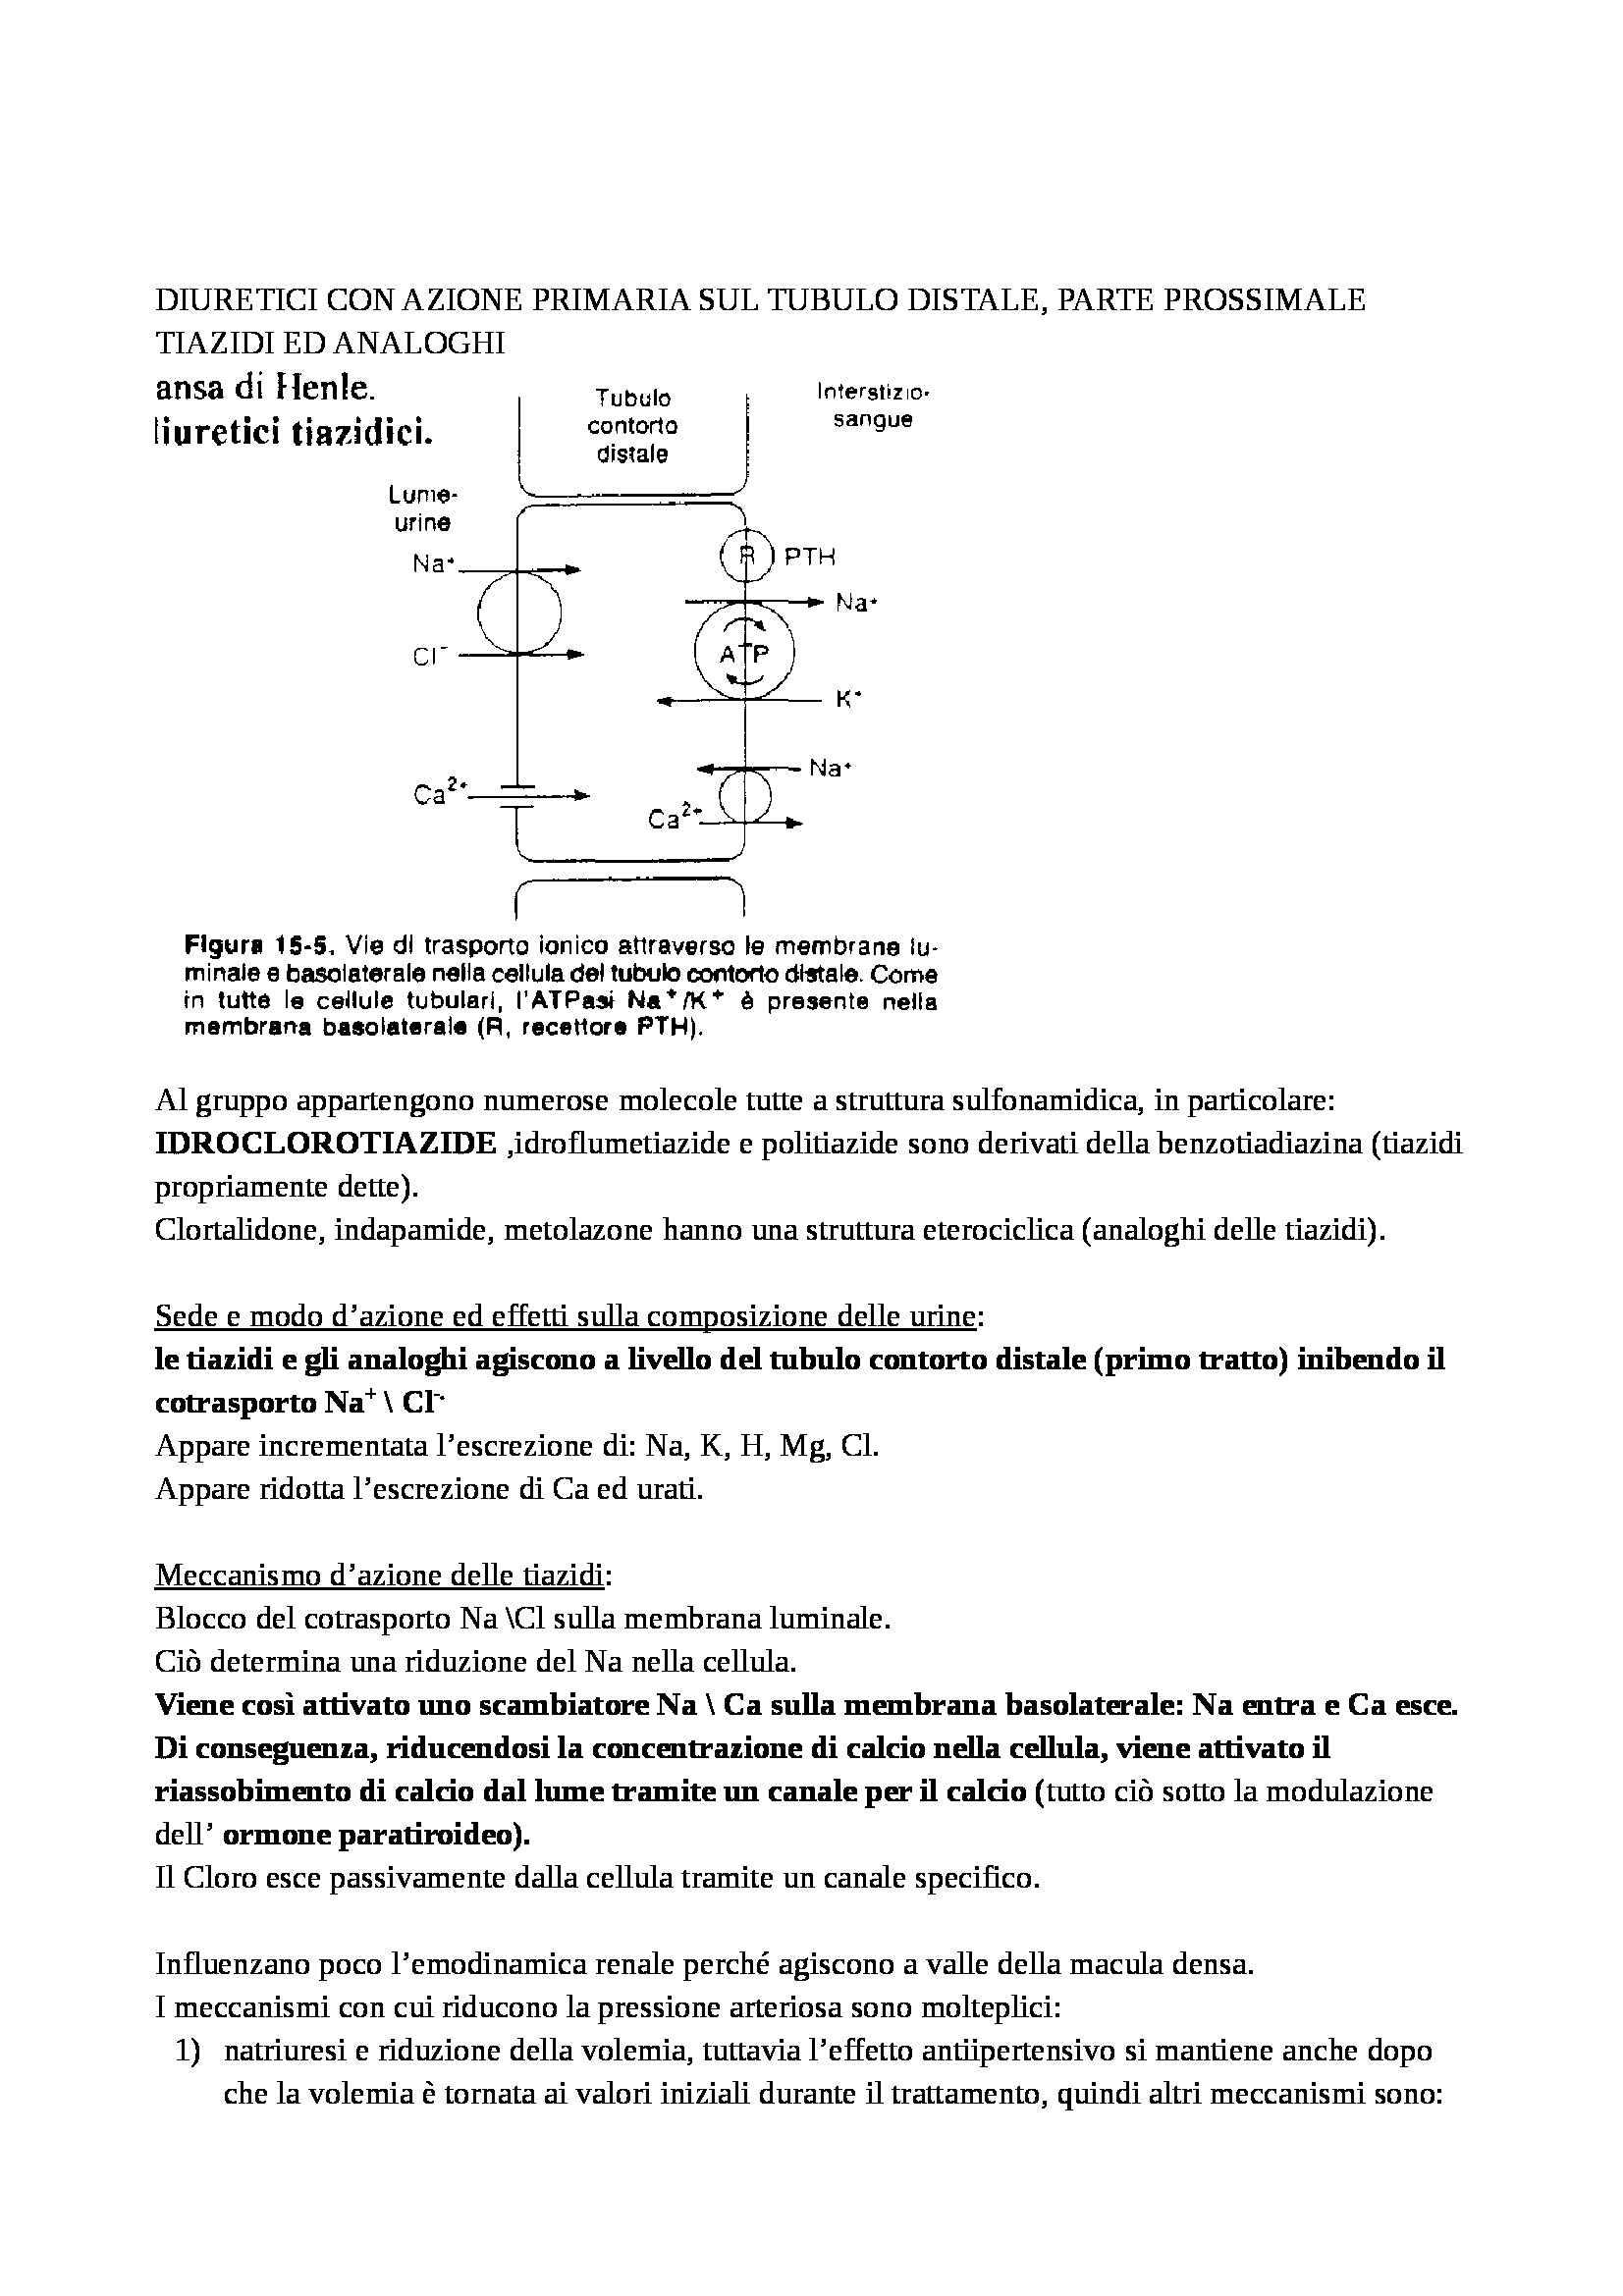 Farmacologia - diuretici Pag. 11